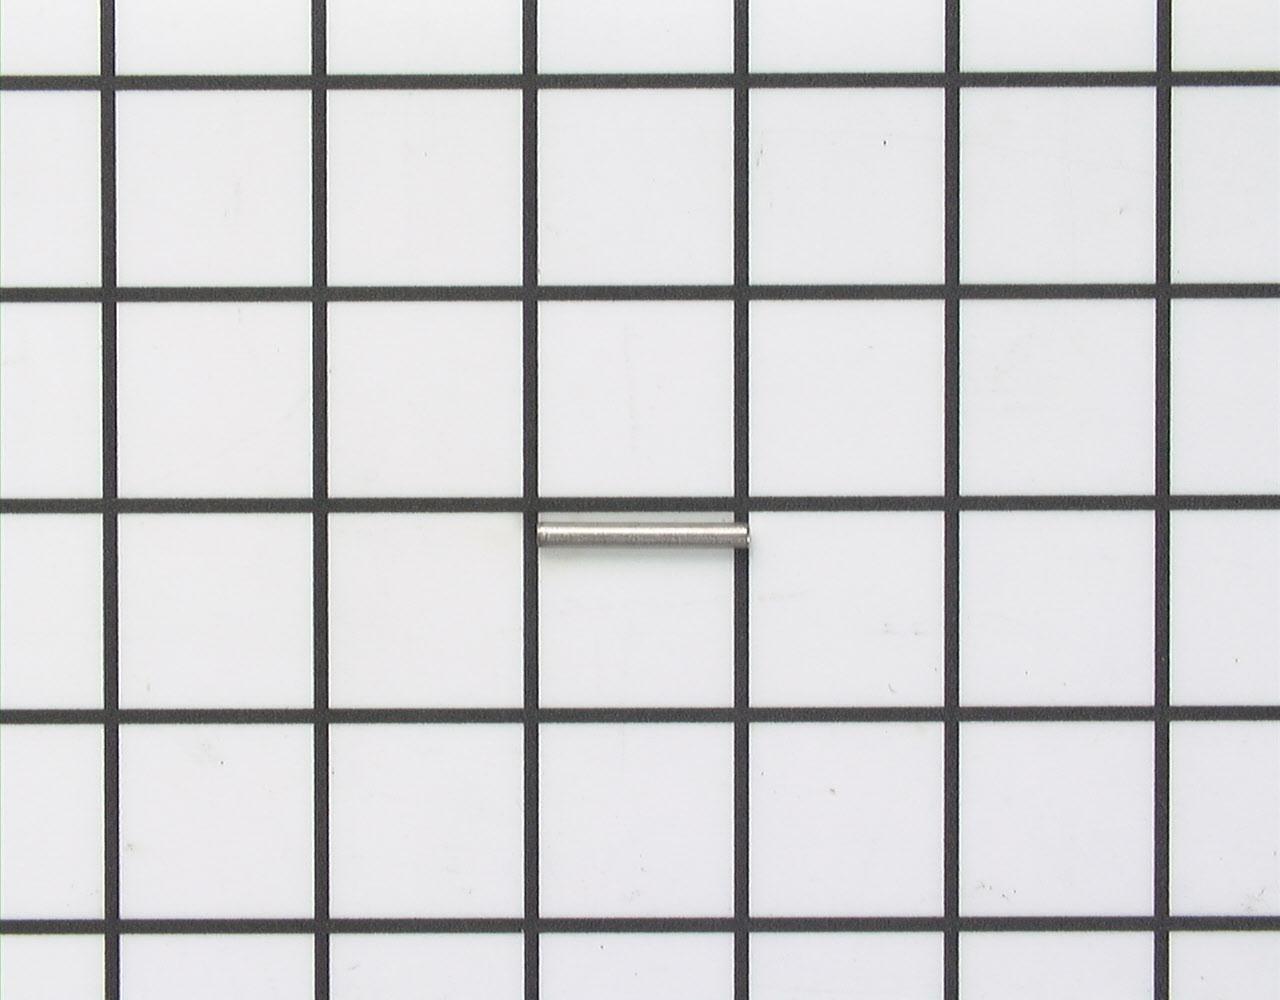 WP6-912678 Maytag Washing Machine Part -Hinge Pin